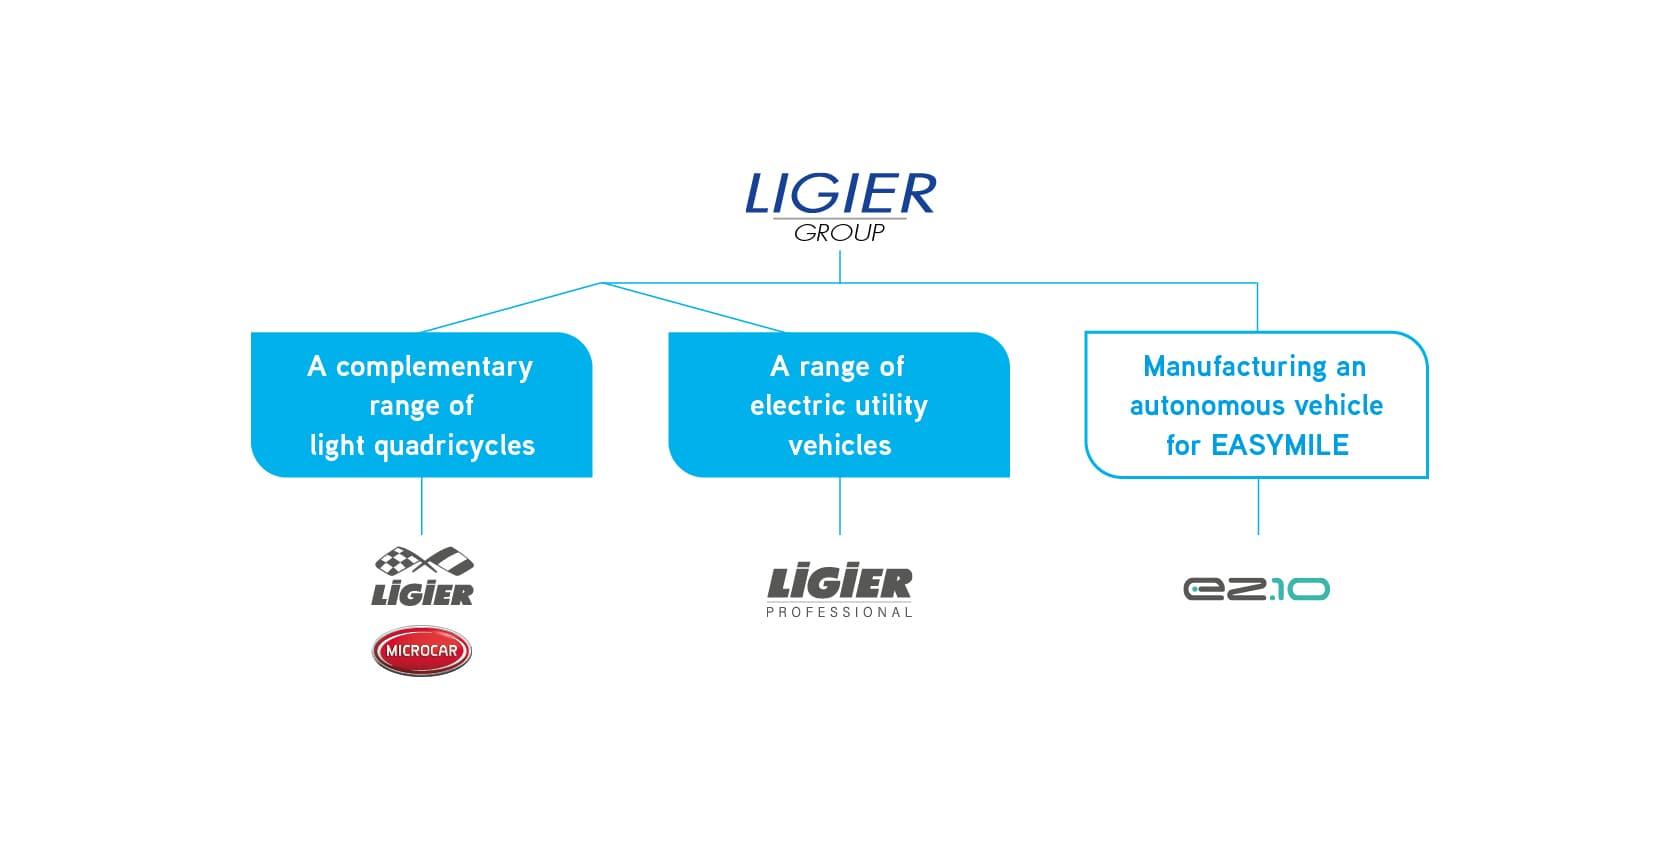 Gammes Ligier Group